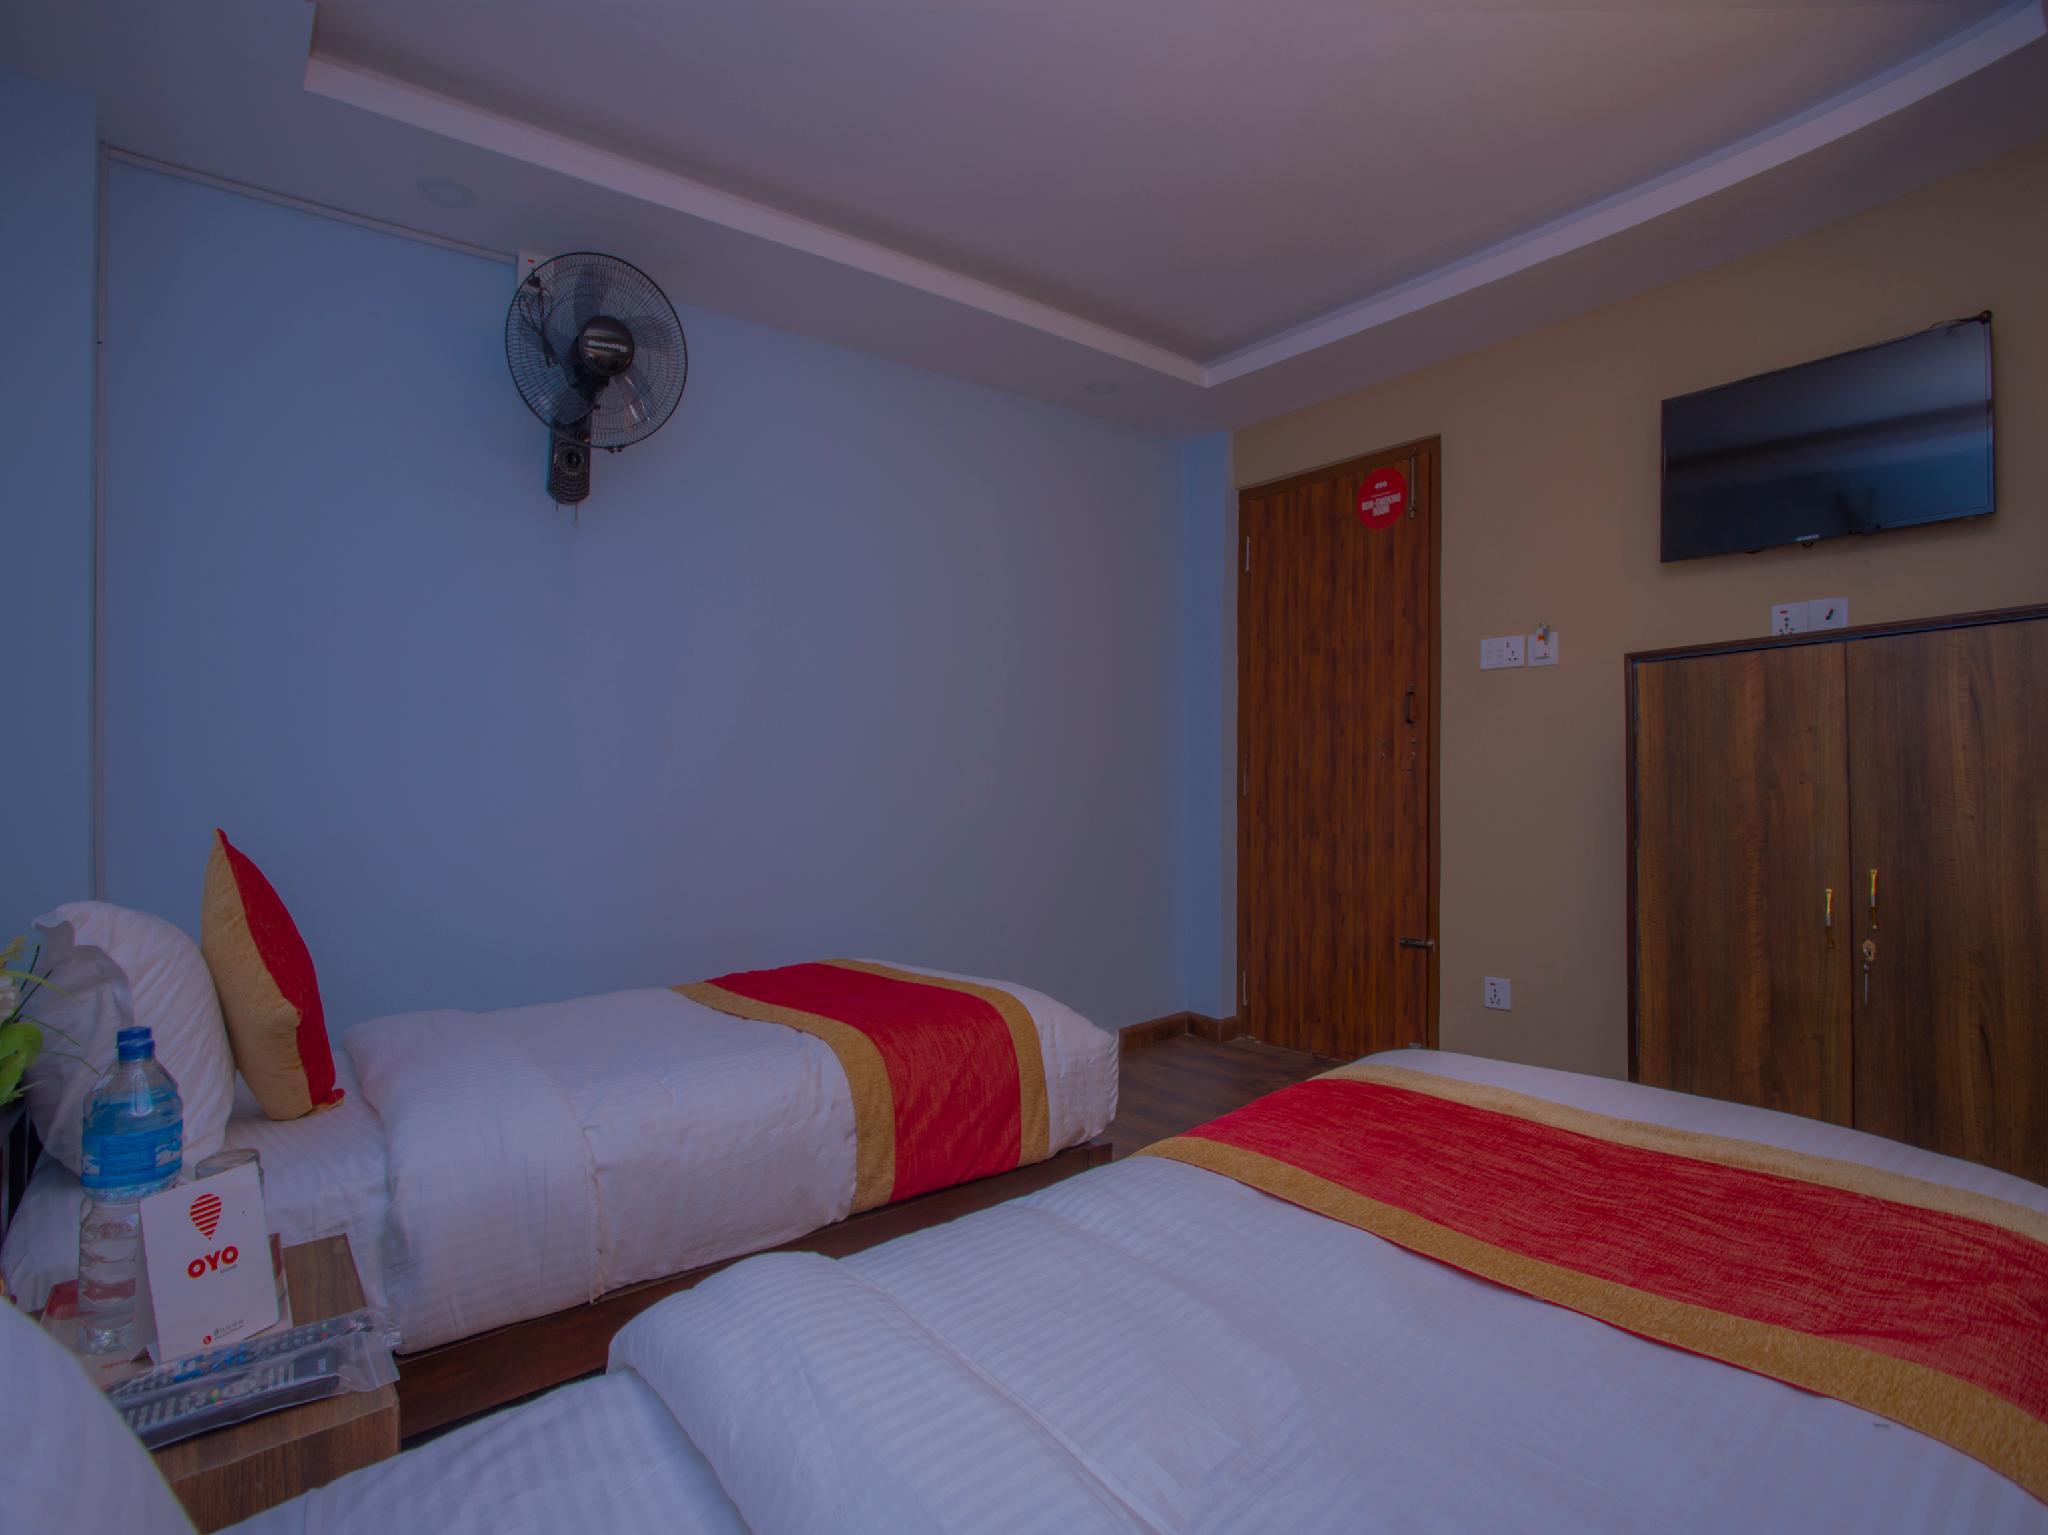 OYO 35395 Hotel Vijaya Park, Kottayam